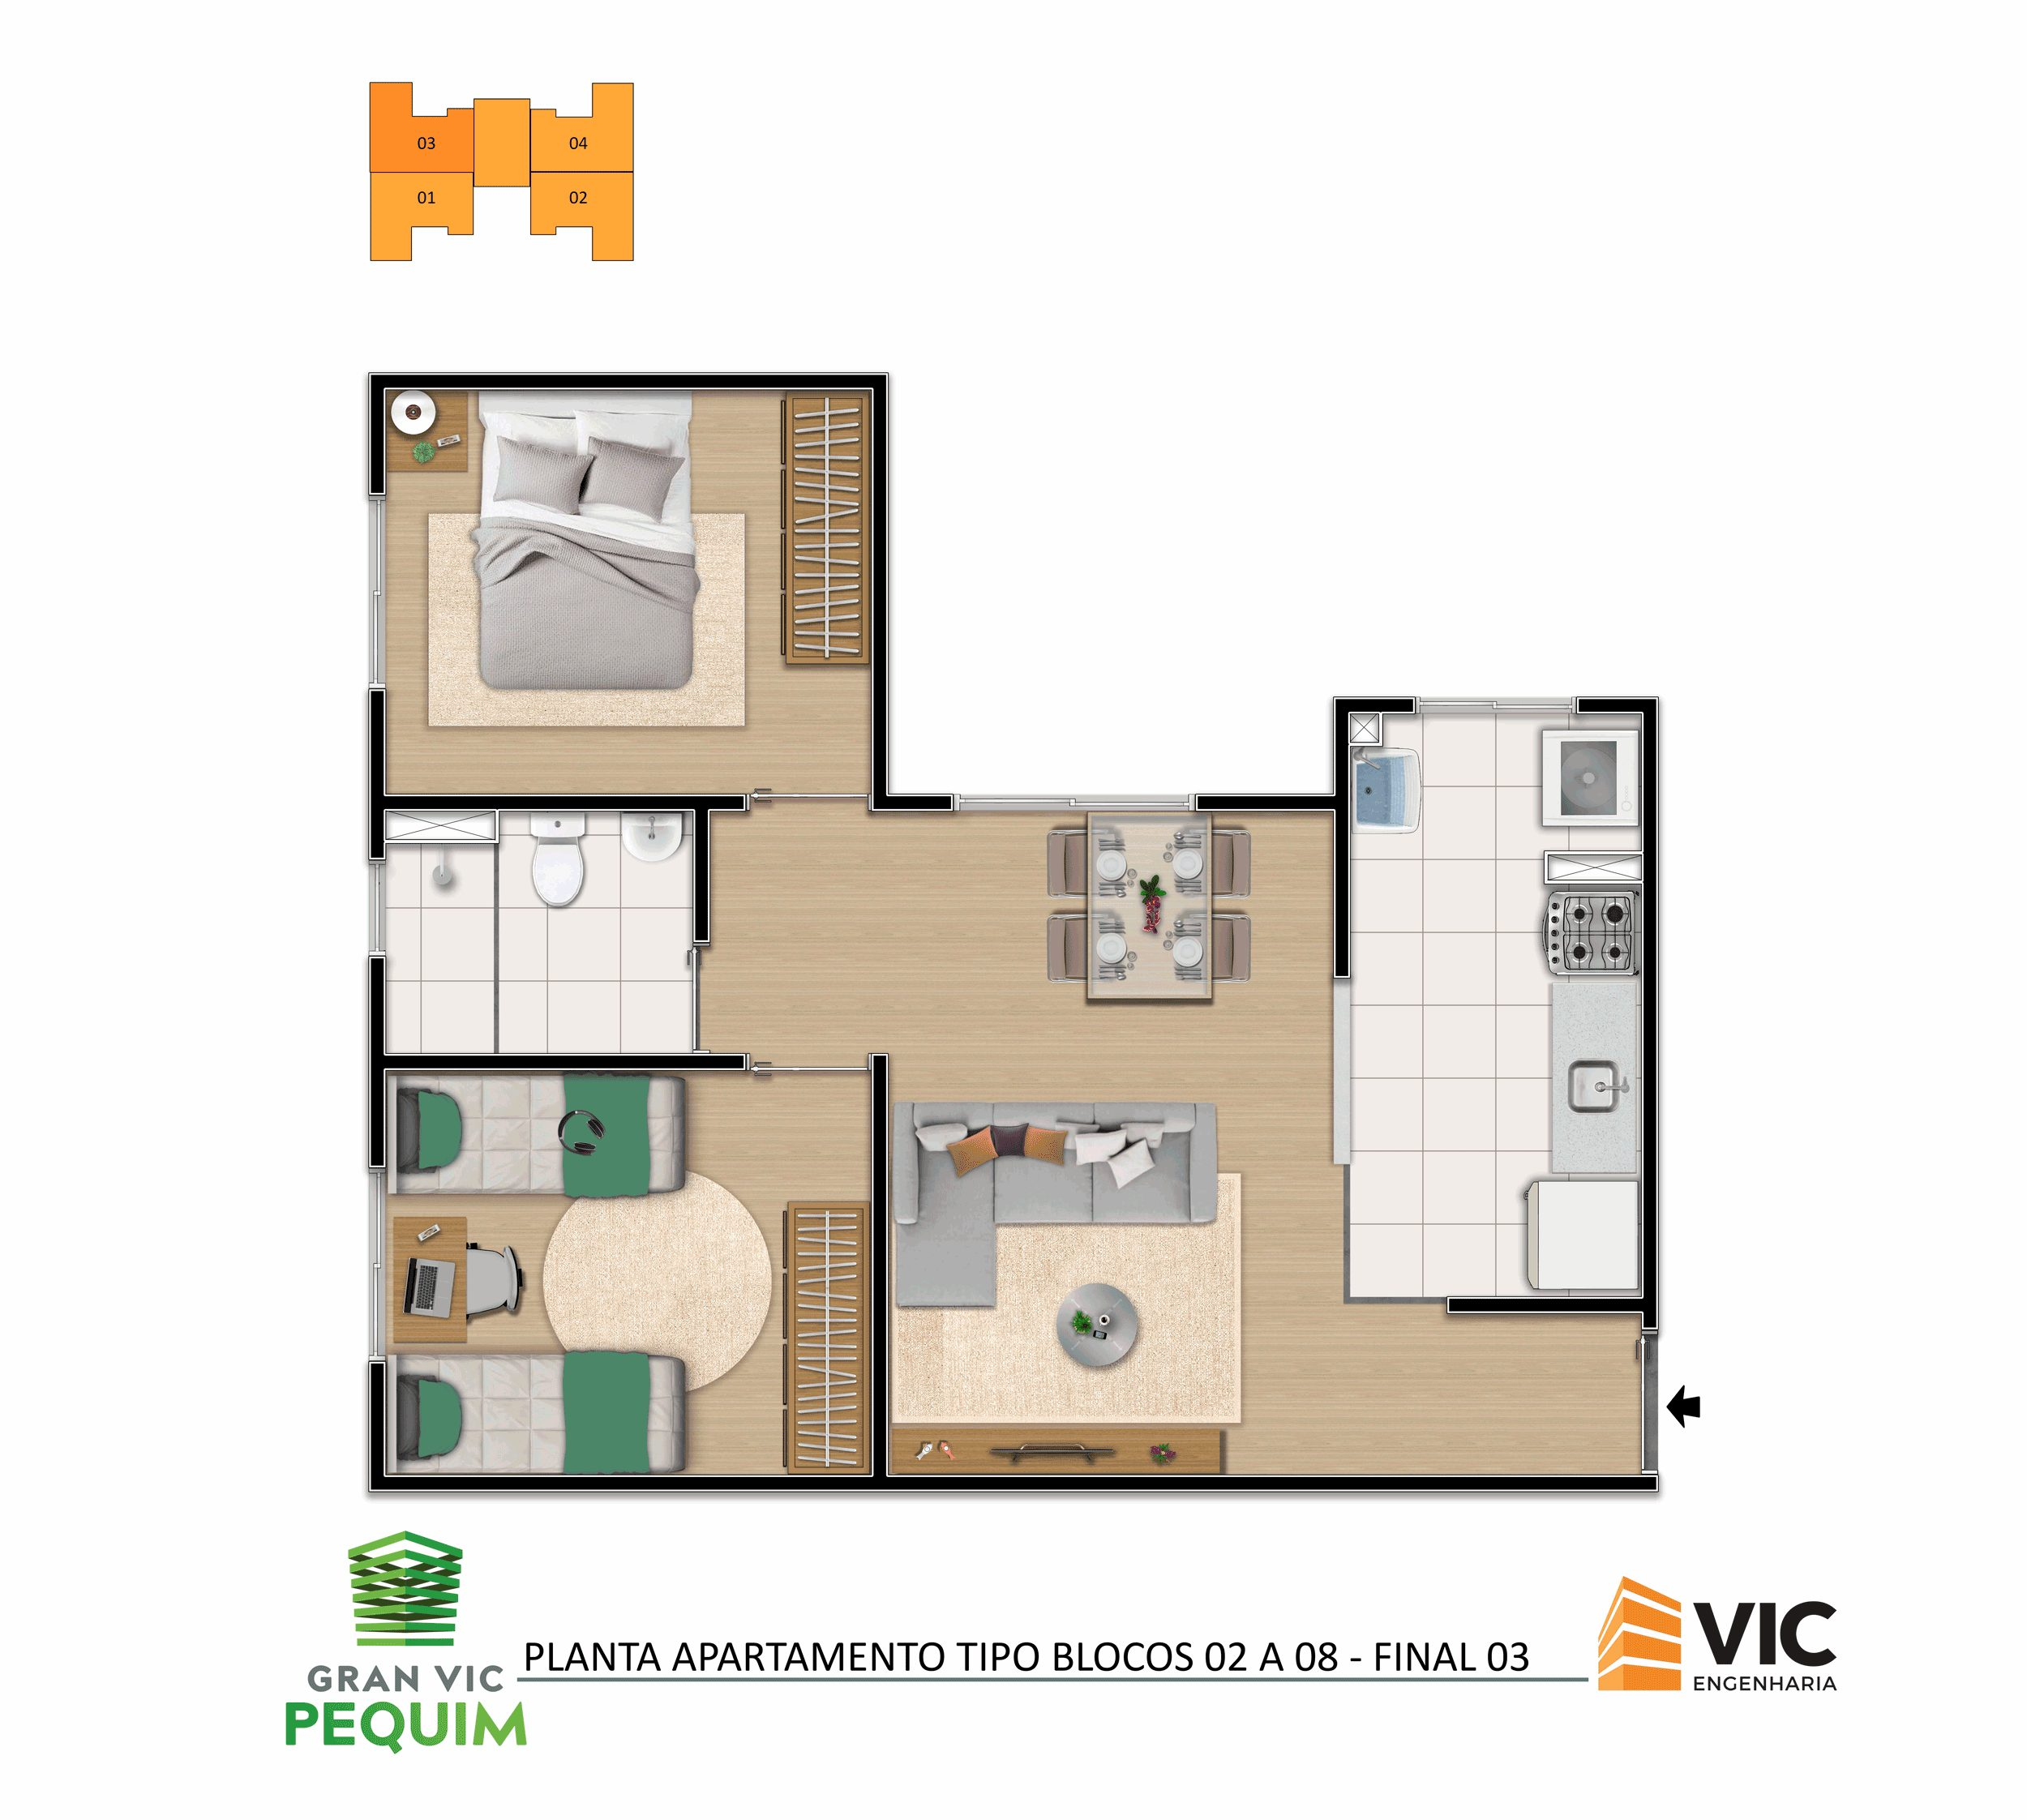 vic-engenharia-gran-vic-pequim-apartamento-tipo-torre-2-a-8